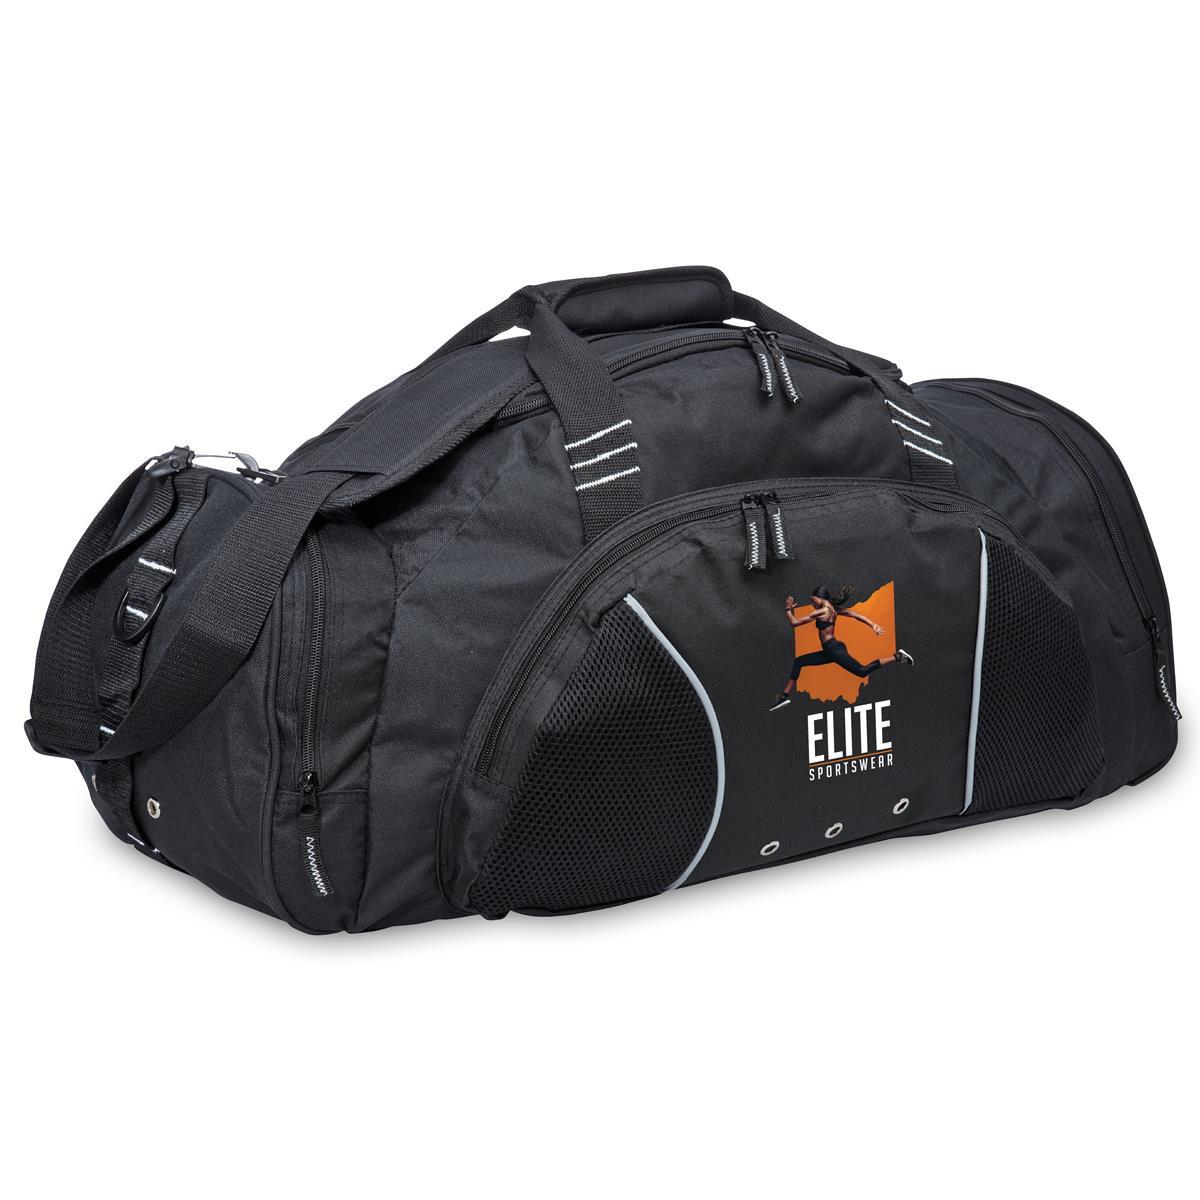 Travel Sports Bag – B240A